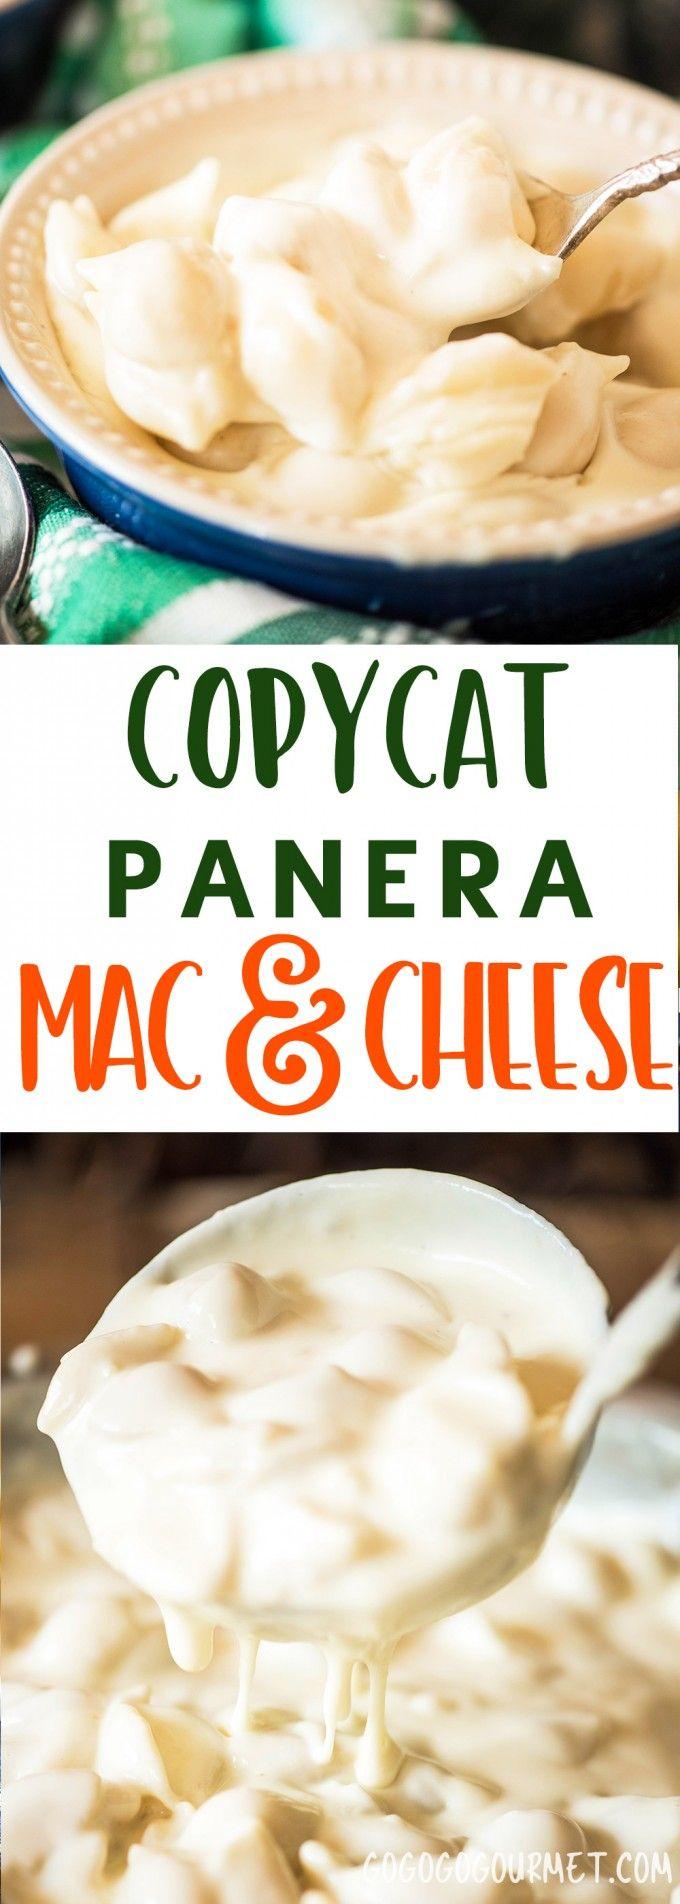 Copycat Panera Mac and Cheese Go Go Go Gourmet